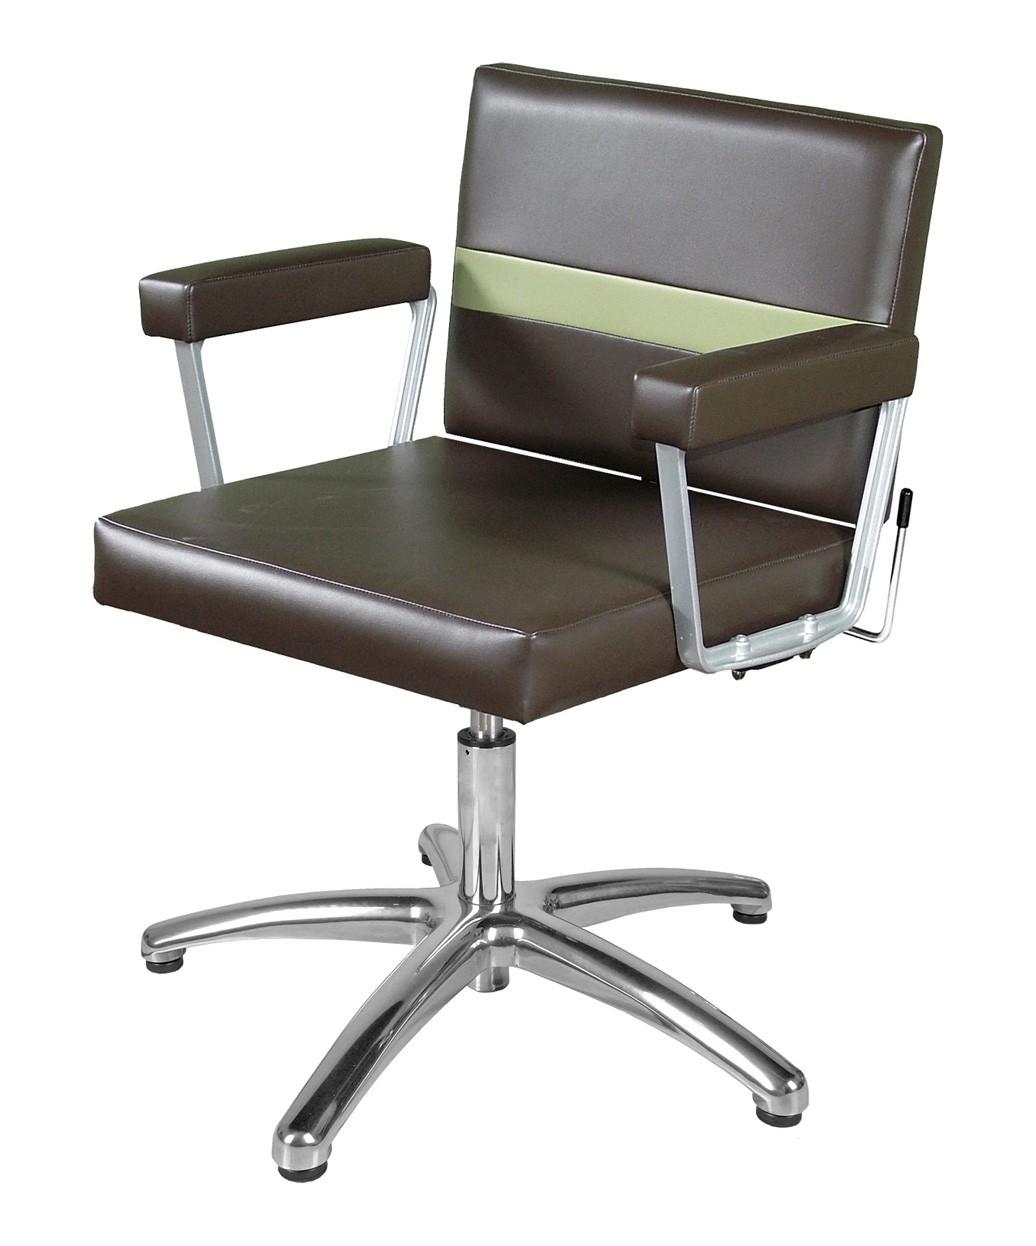 Collins - Taress Shampoo Chair